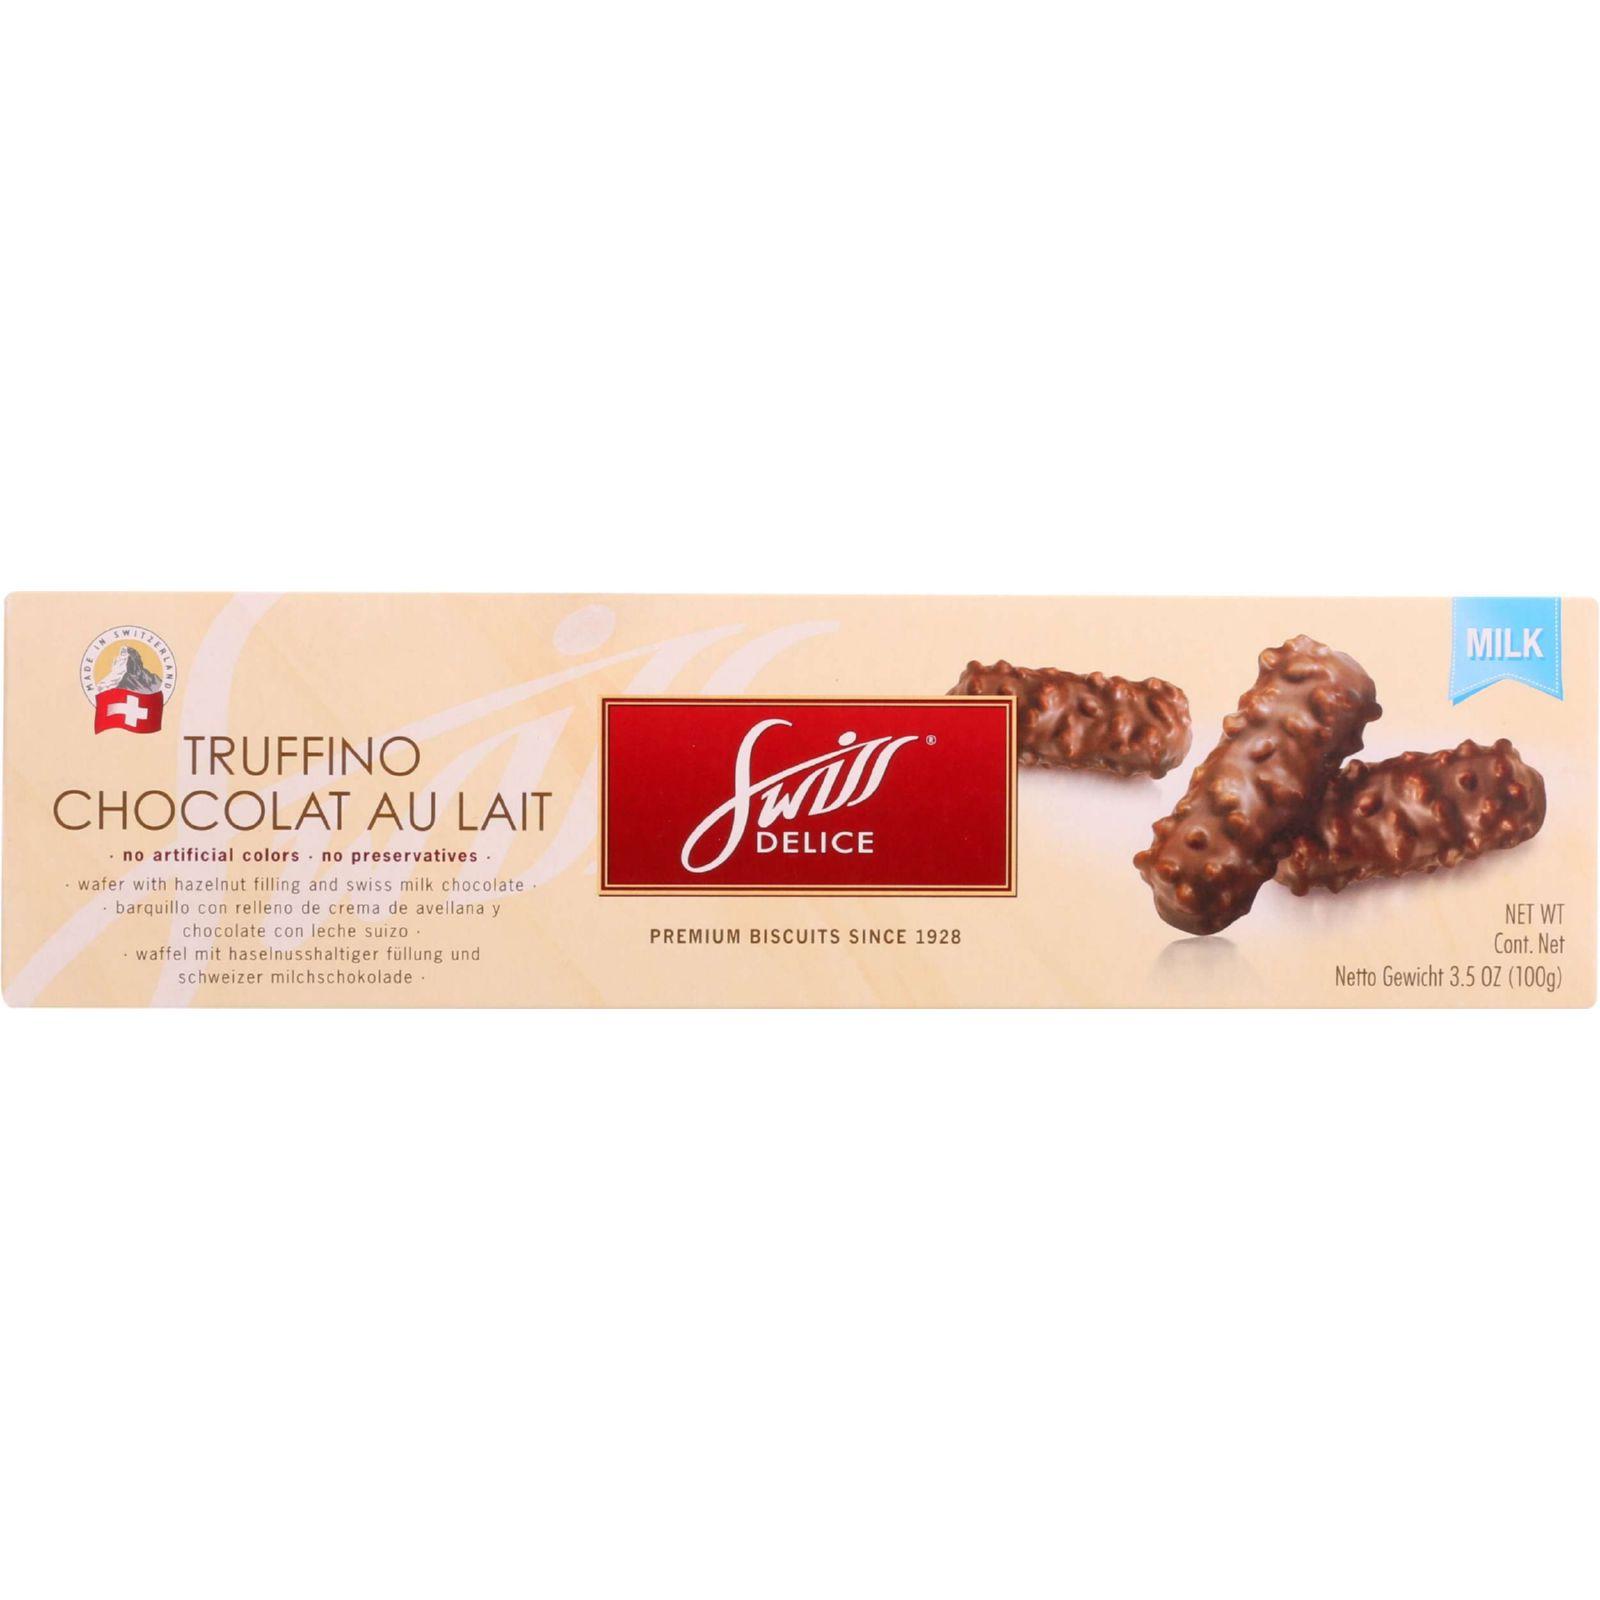 Swiss Delice Cookies - Truffino - Milk Chocolate - 3.5 oz - case of 10